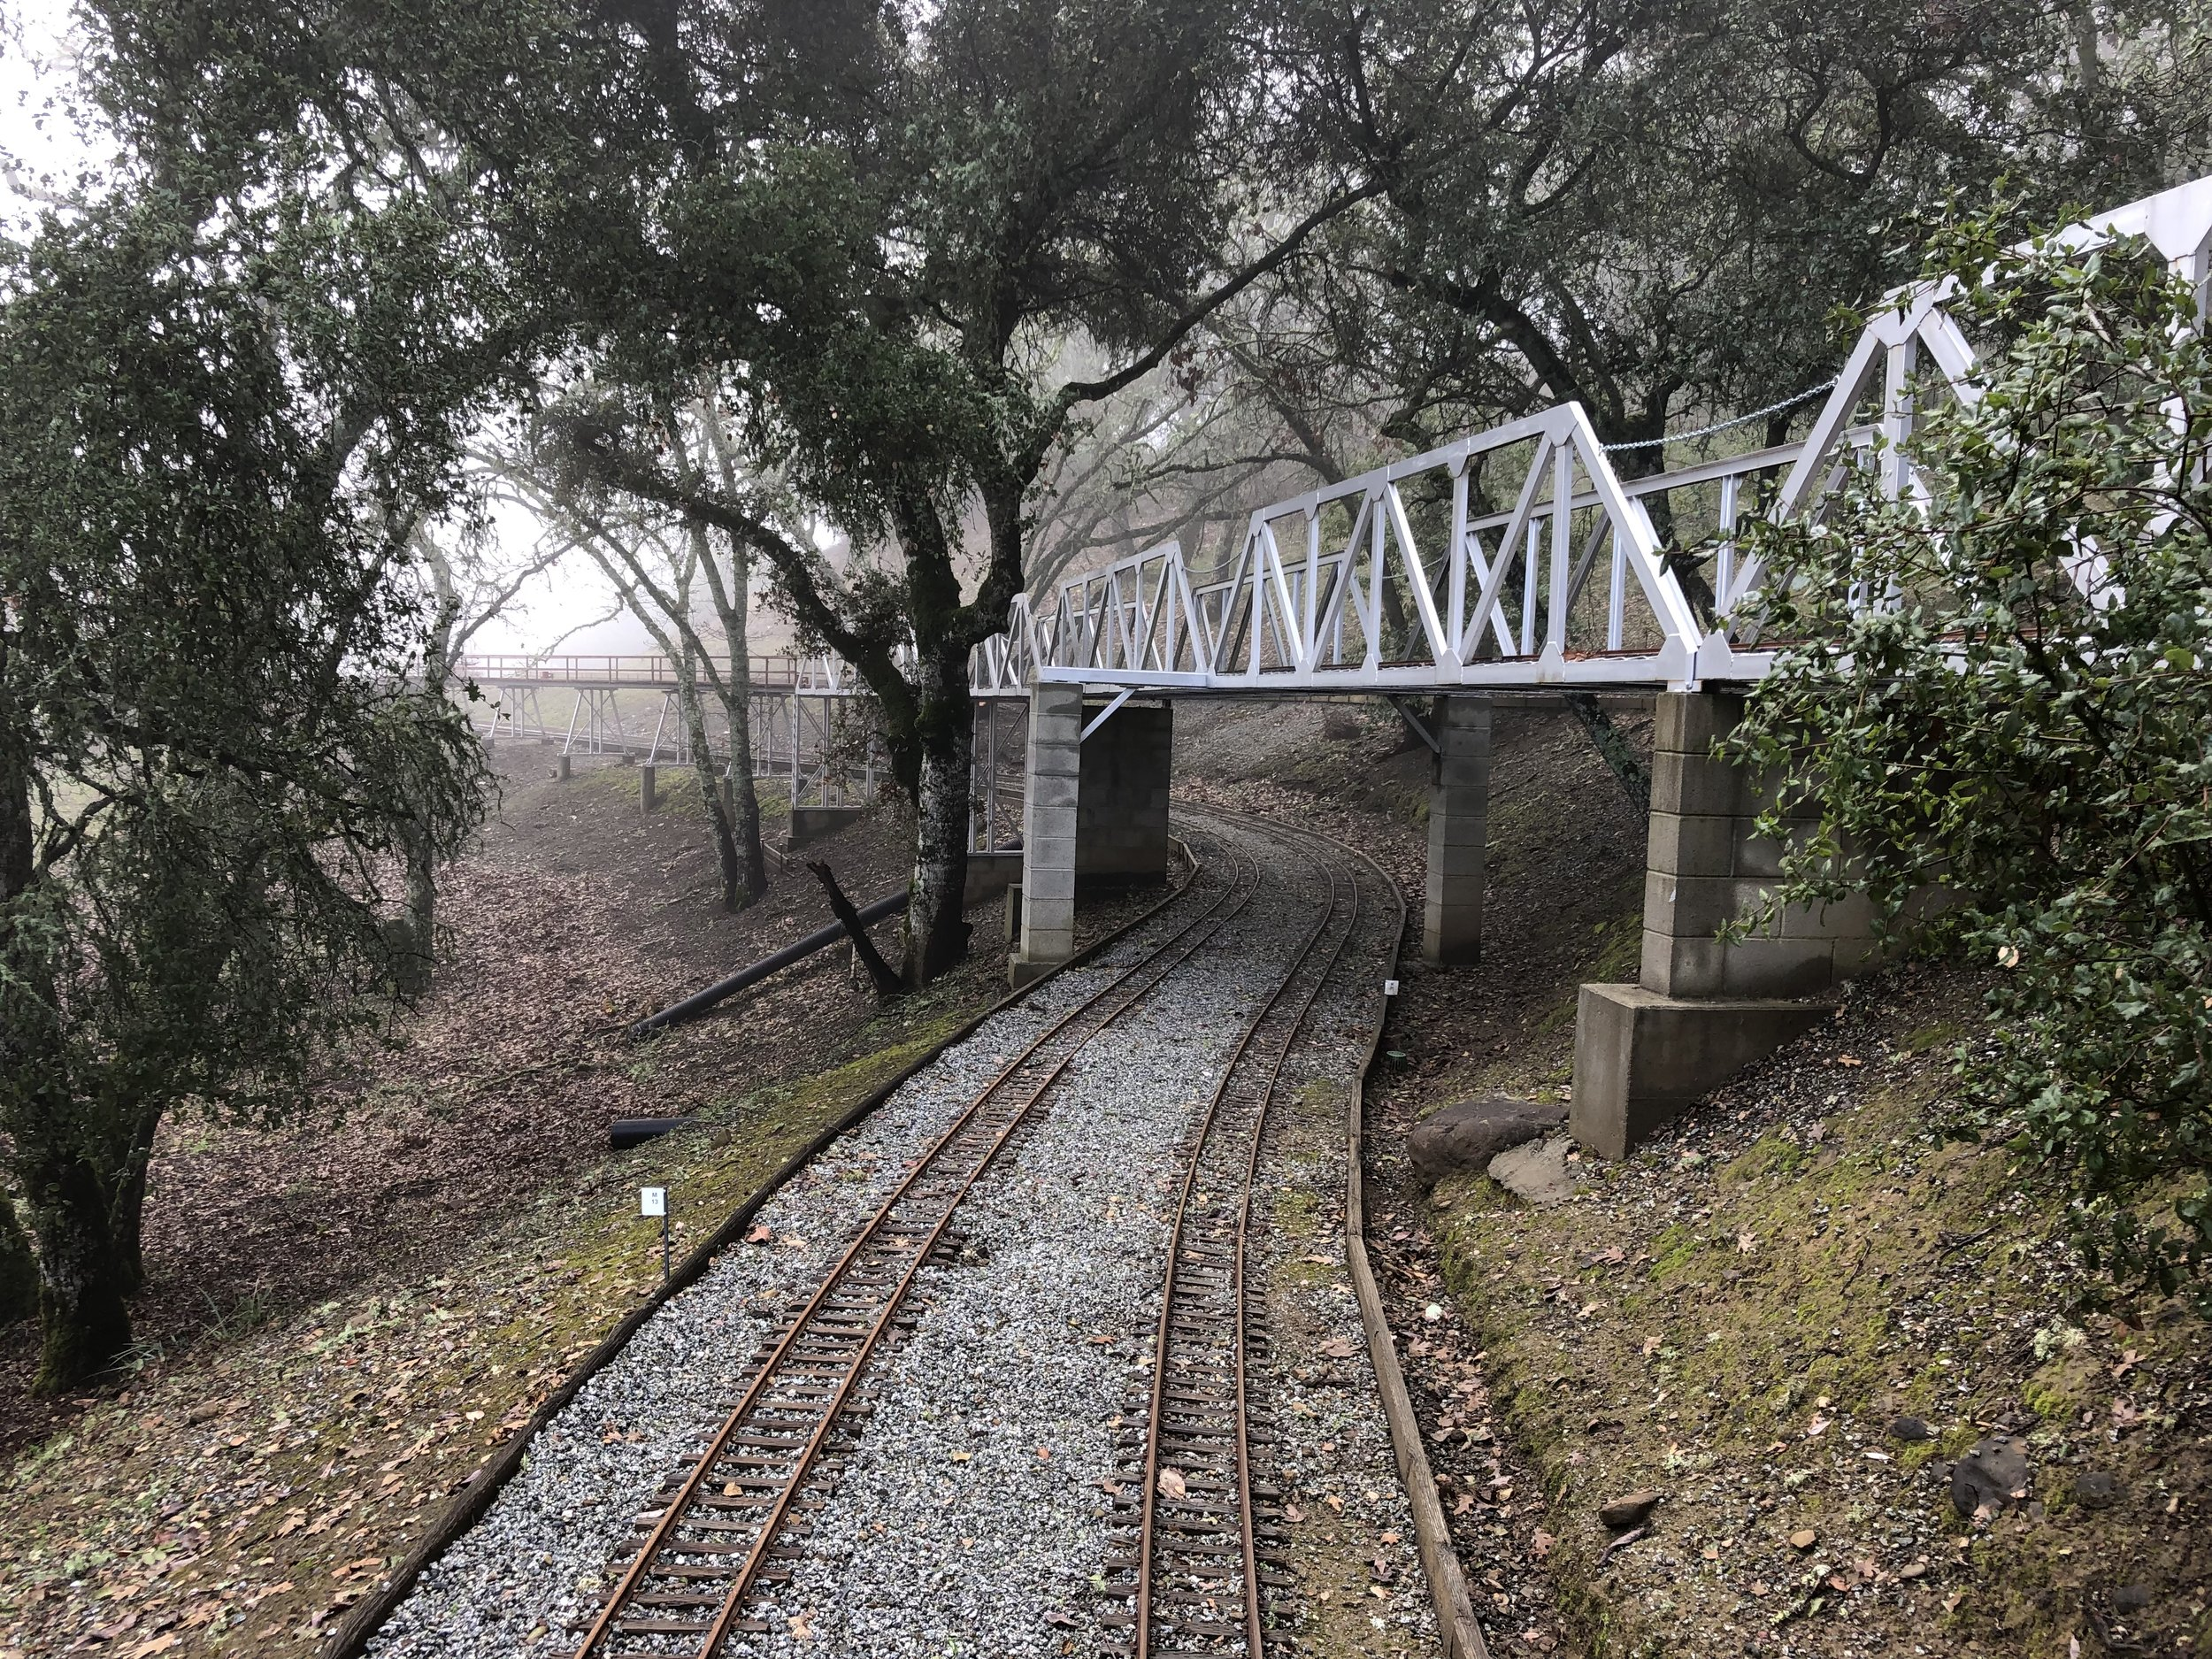 Silver bridge and trestle set